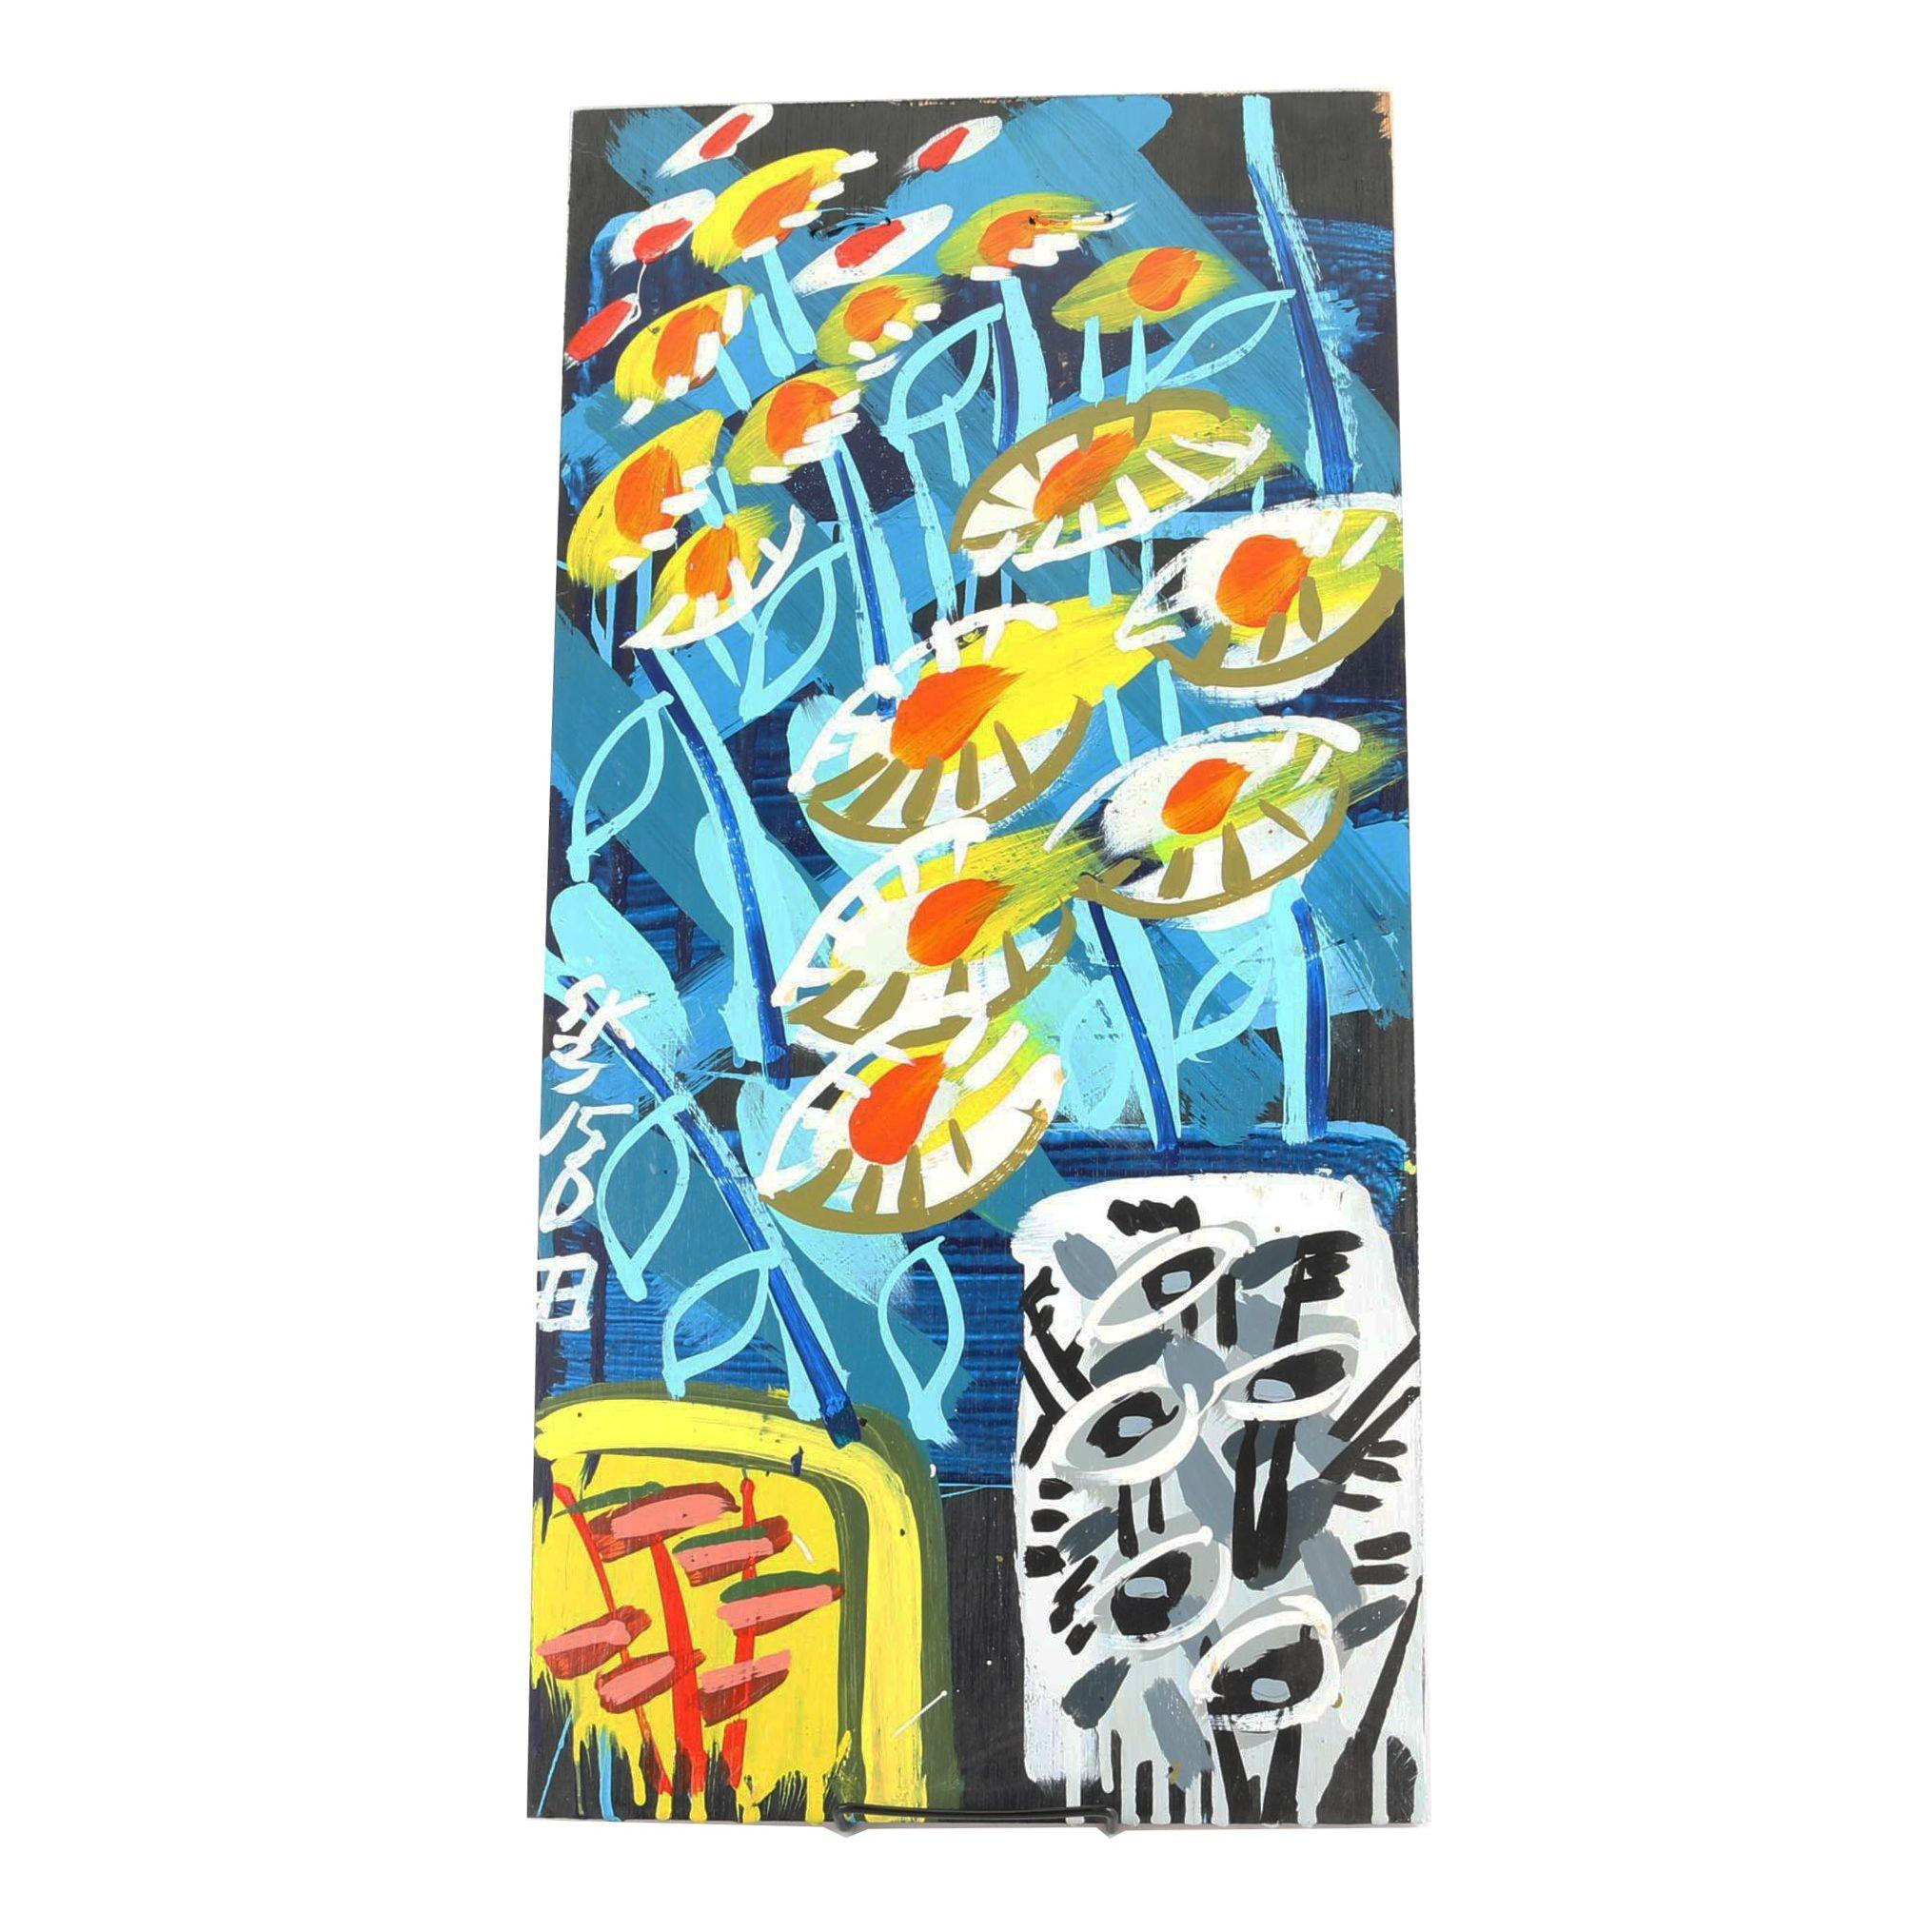 Steve Keene Acrylic Painting on Panel